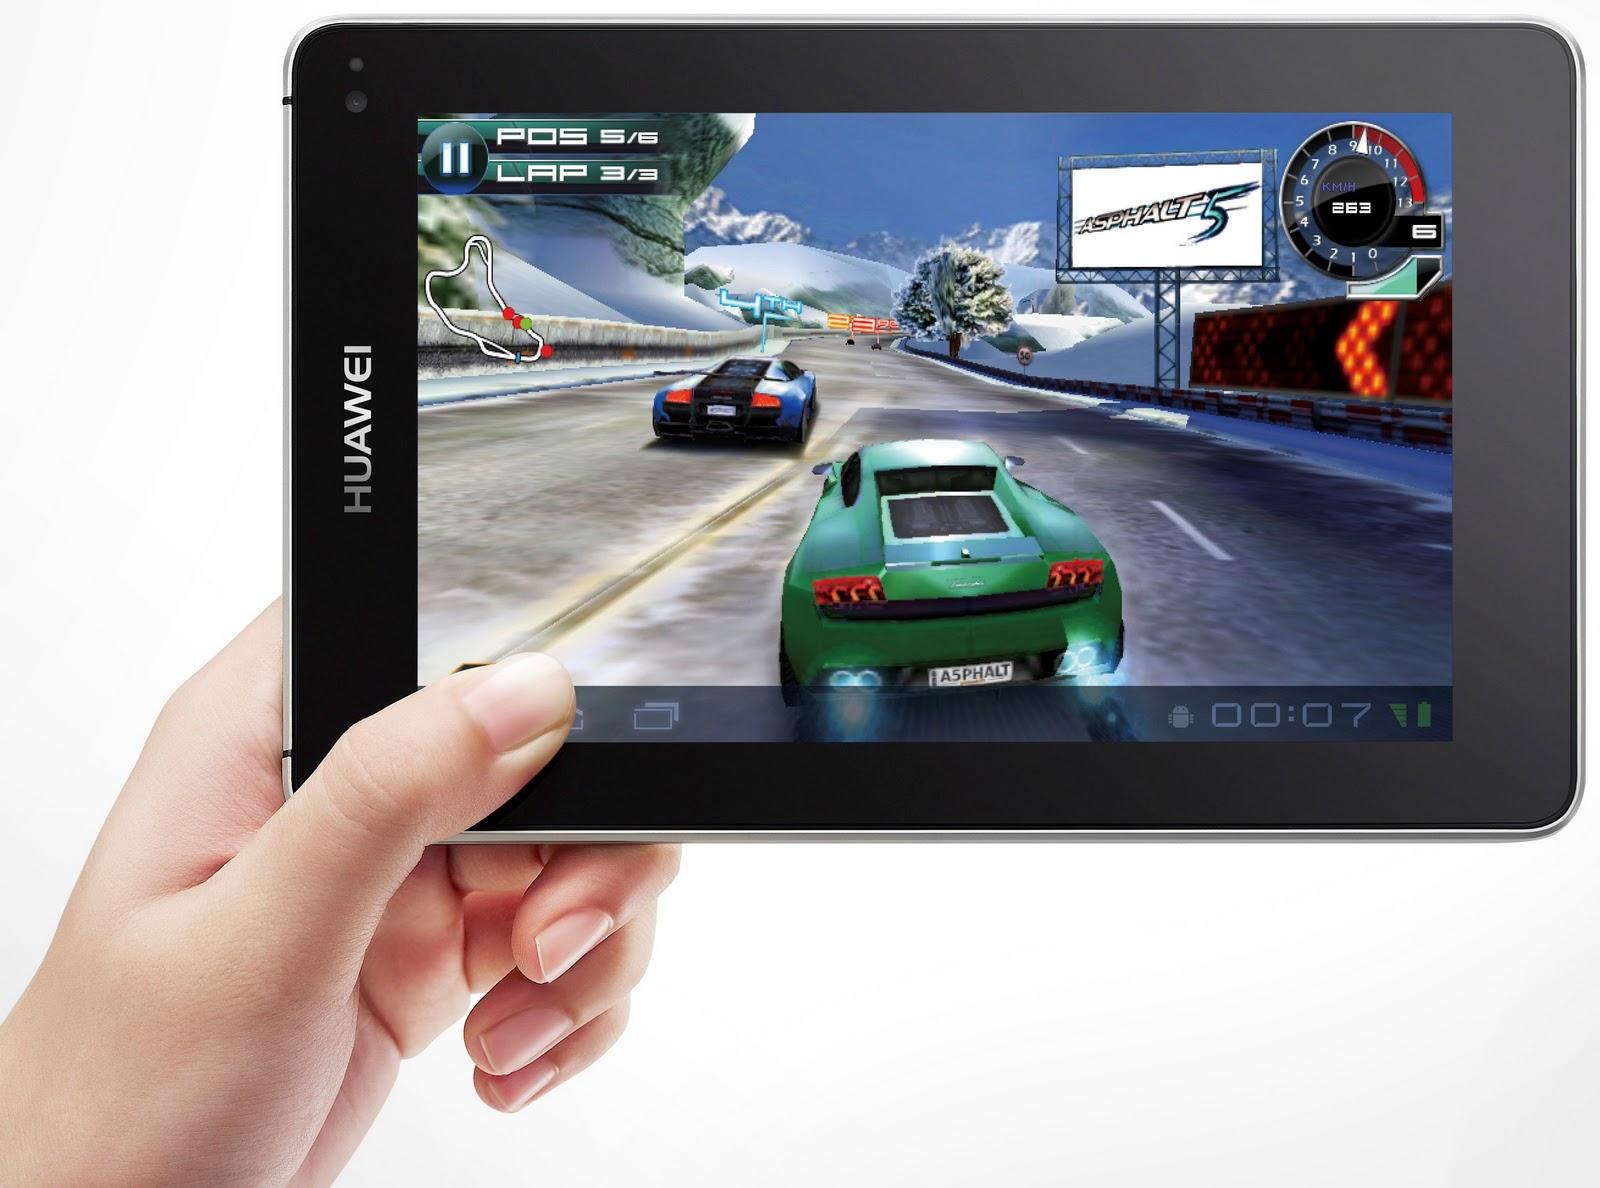 Huawei'nin 'multimedya odaklı' tableti MediaPad 10 FHD, 1,5 GHz